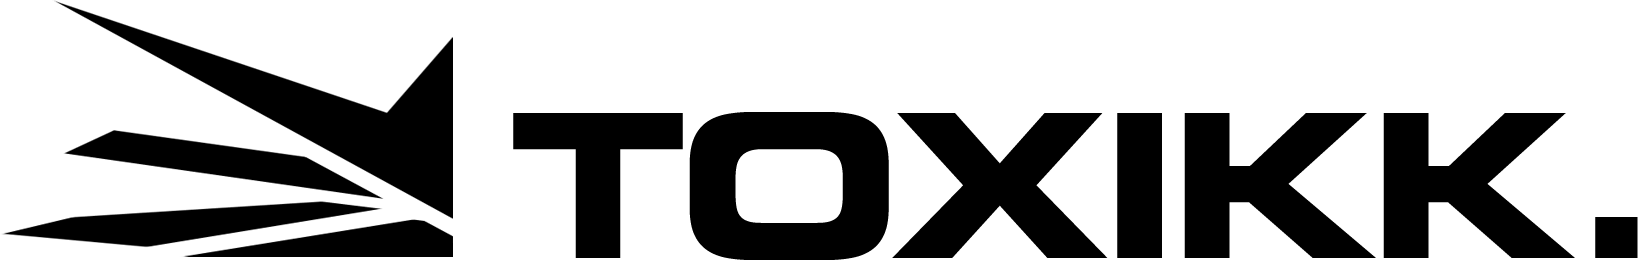 toxikk-logo-black